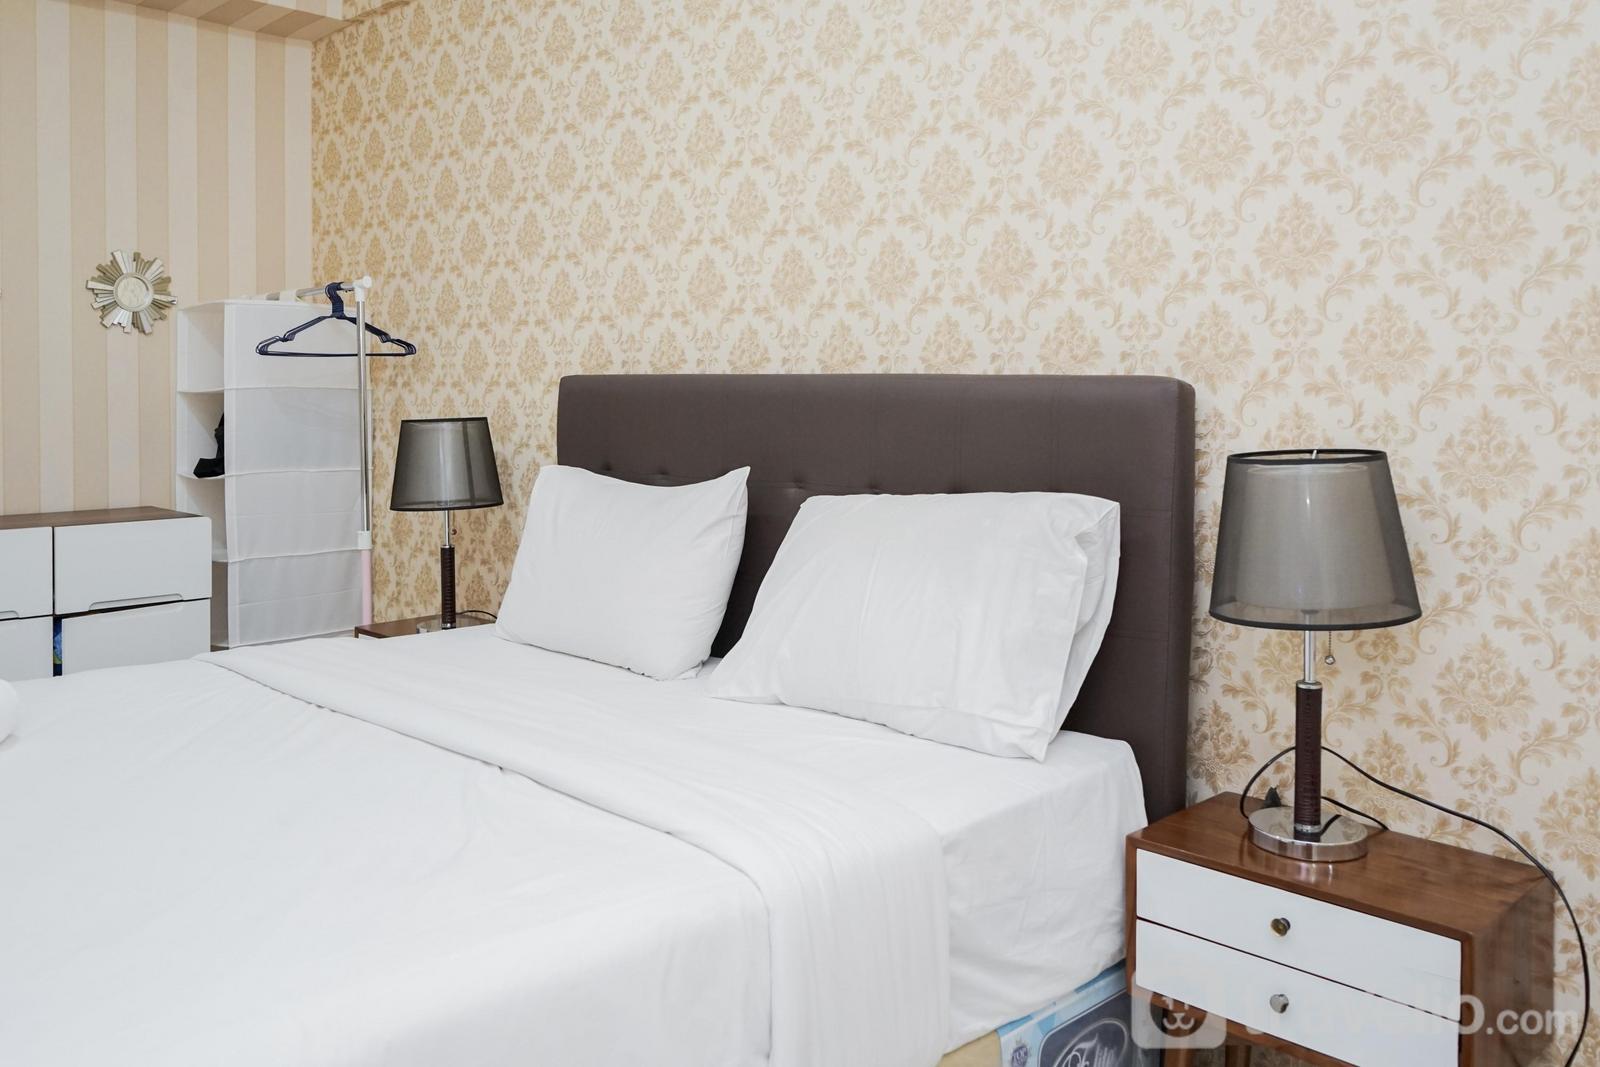 Apartemen Bintaro Park View - Minimalist Studio Room at Bintaro Park View Apartment By Travelio